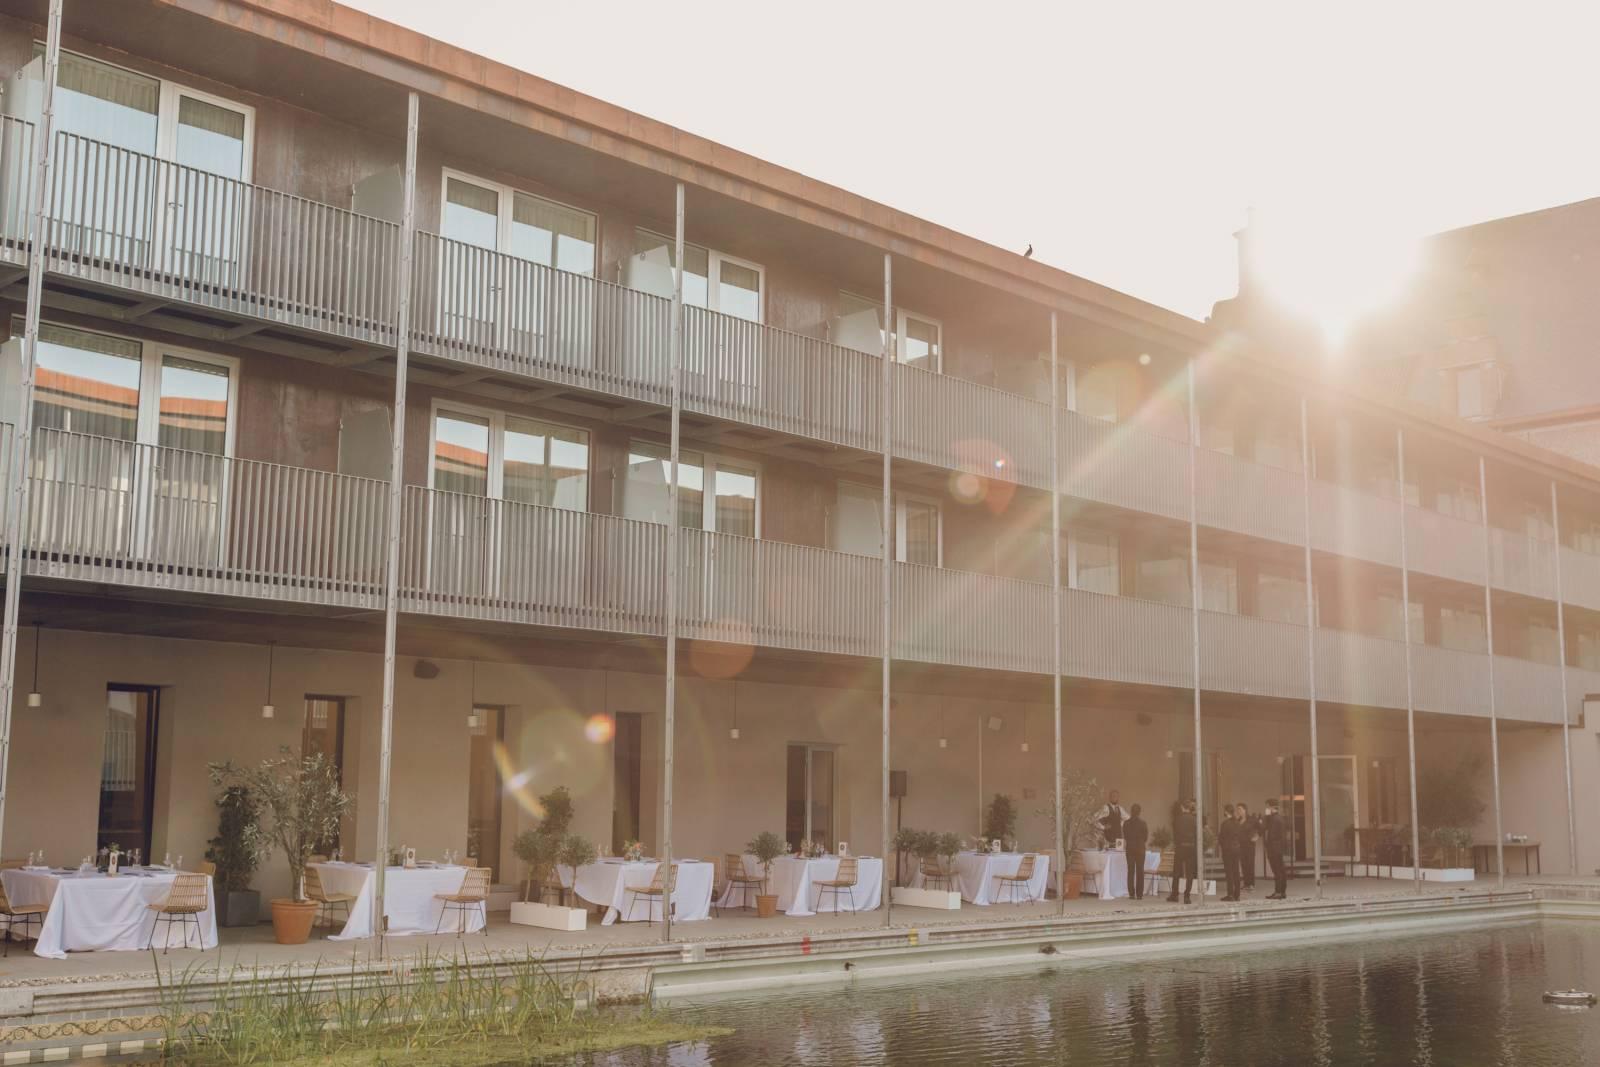 Van der Valk Hotel Mechelen - House of Weddings - 3